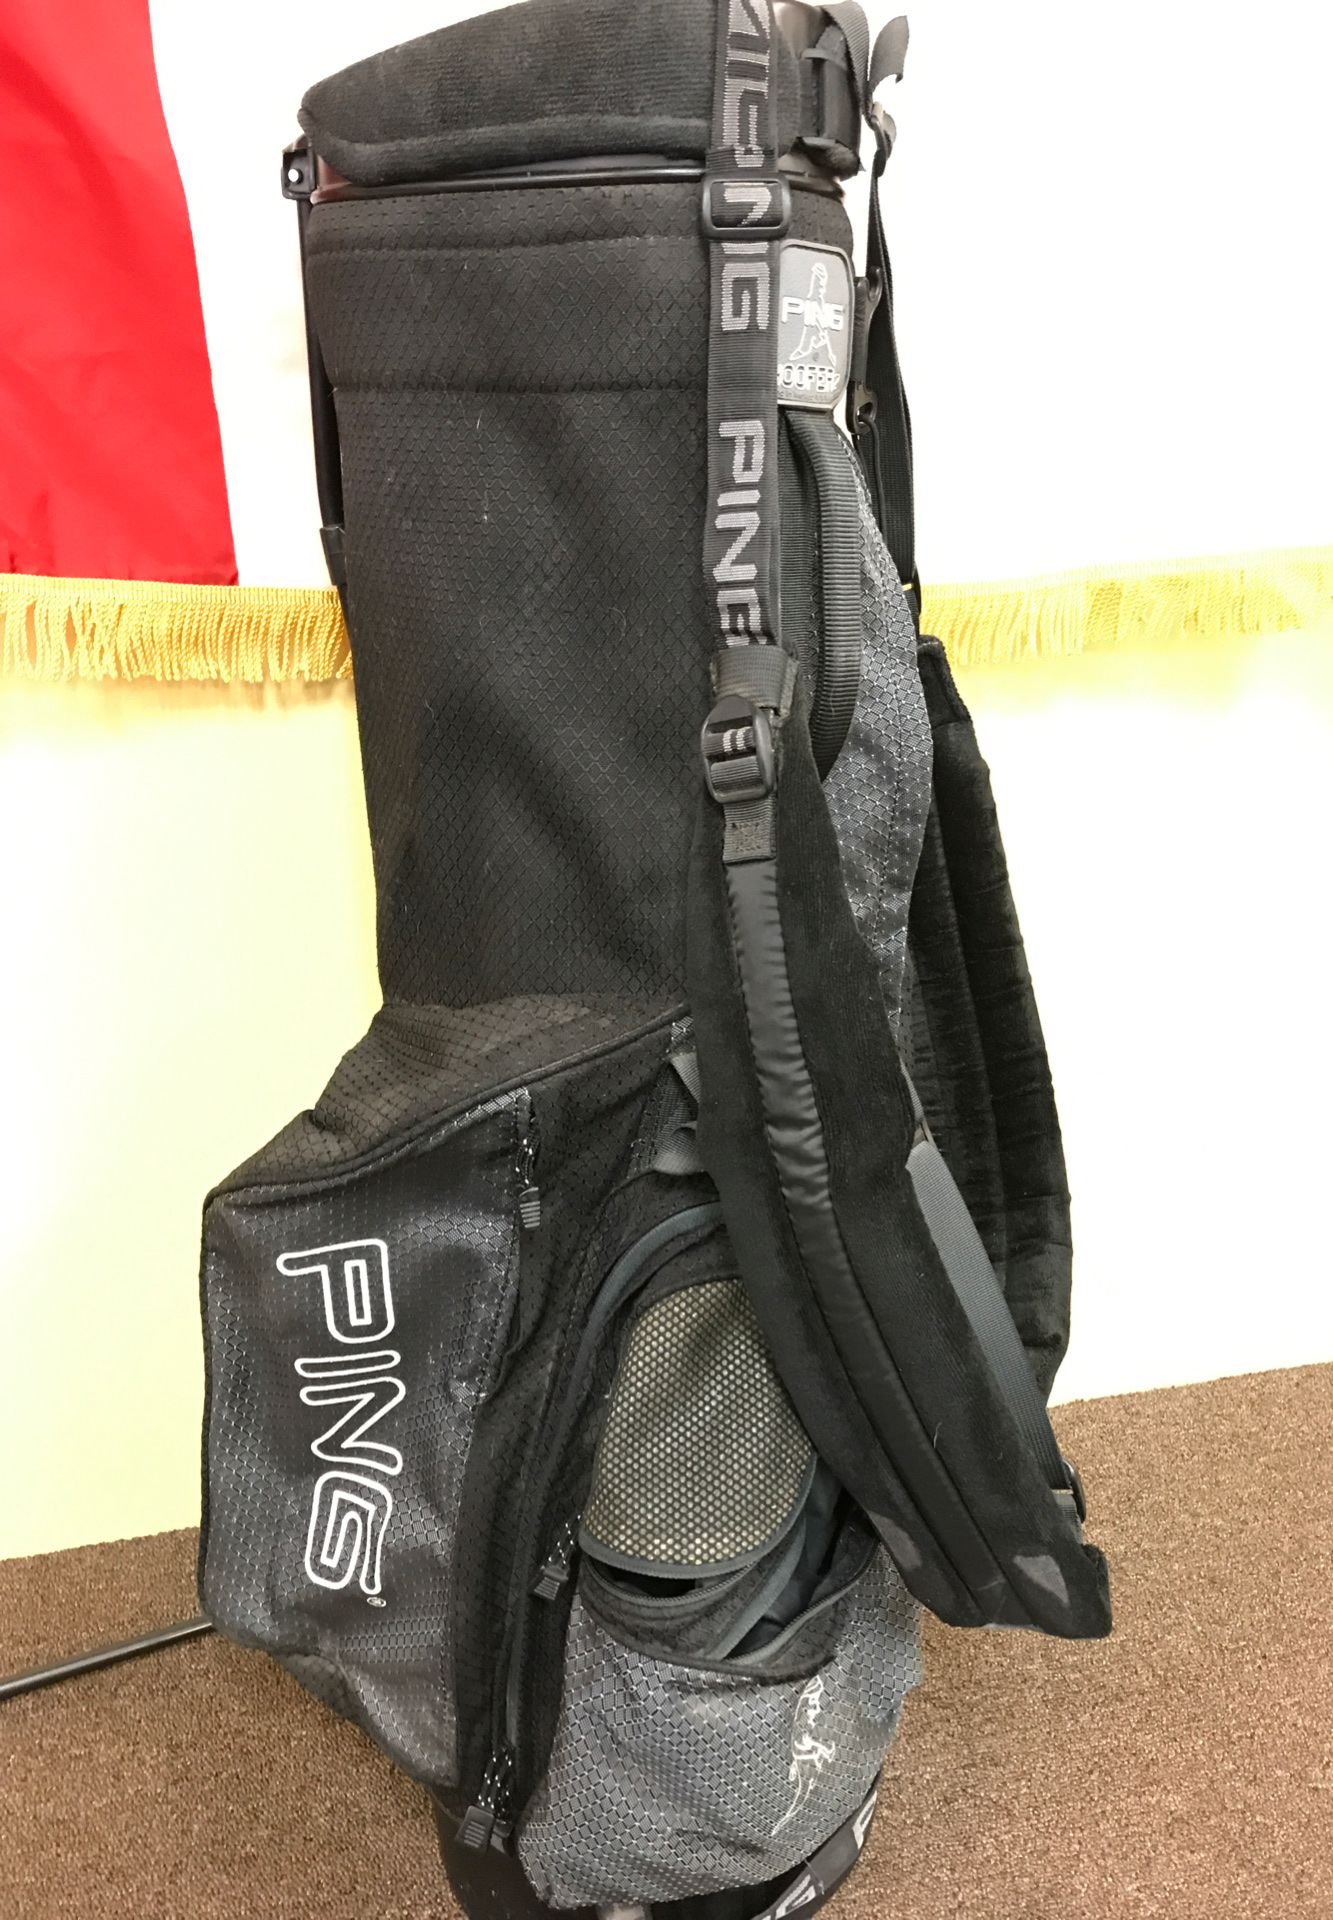 PING Hoofer 2 Golf Bag